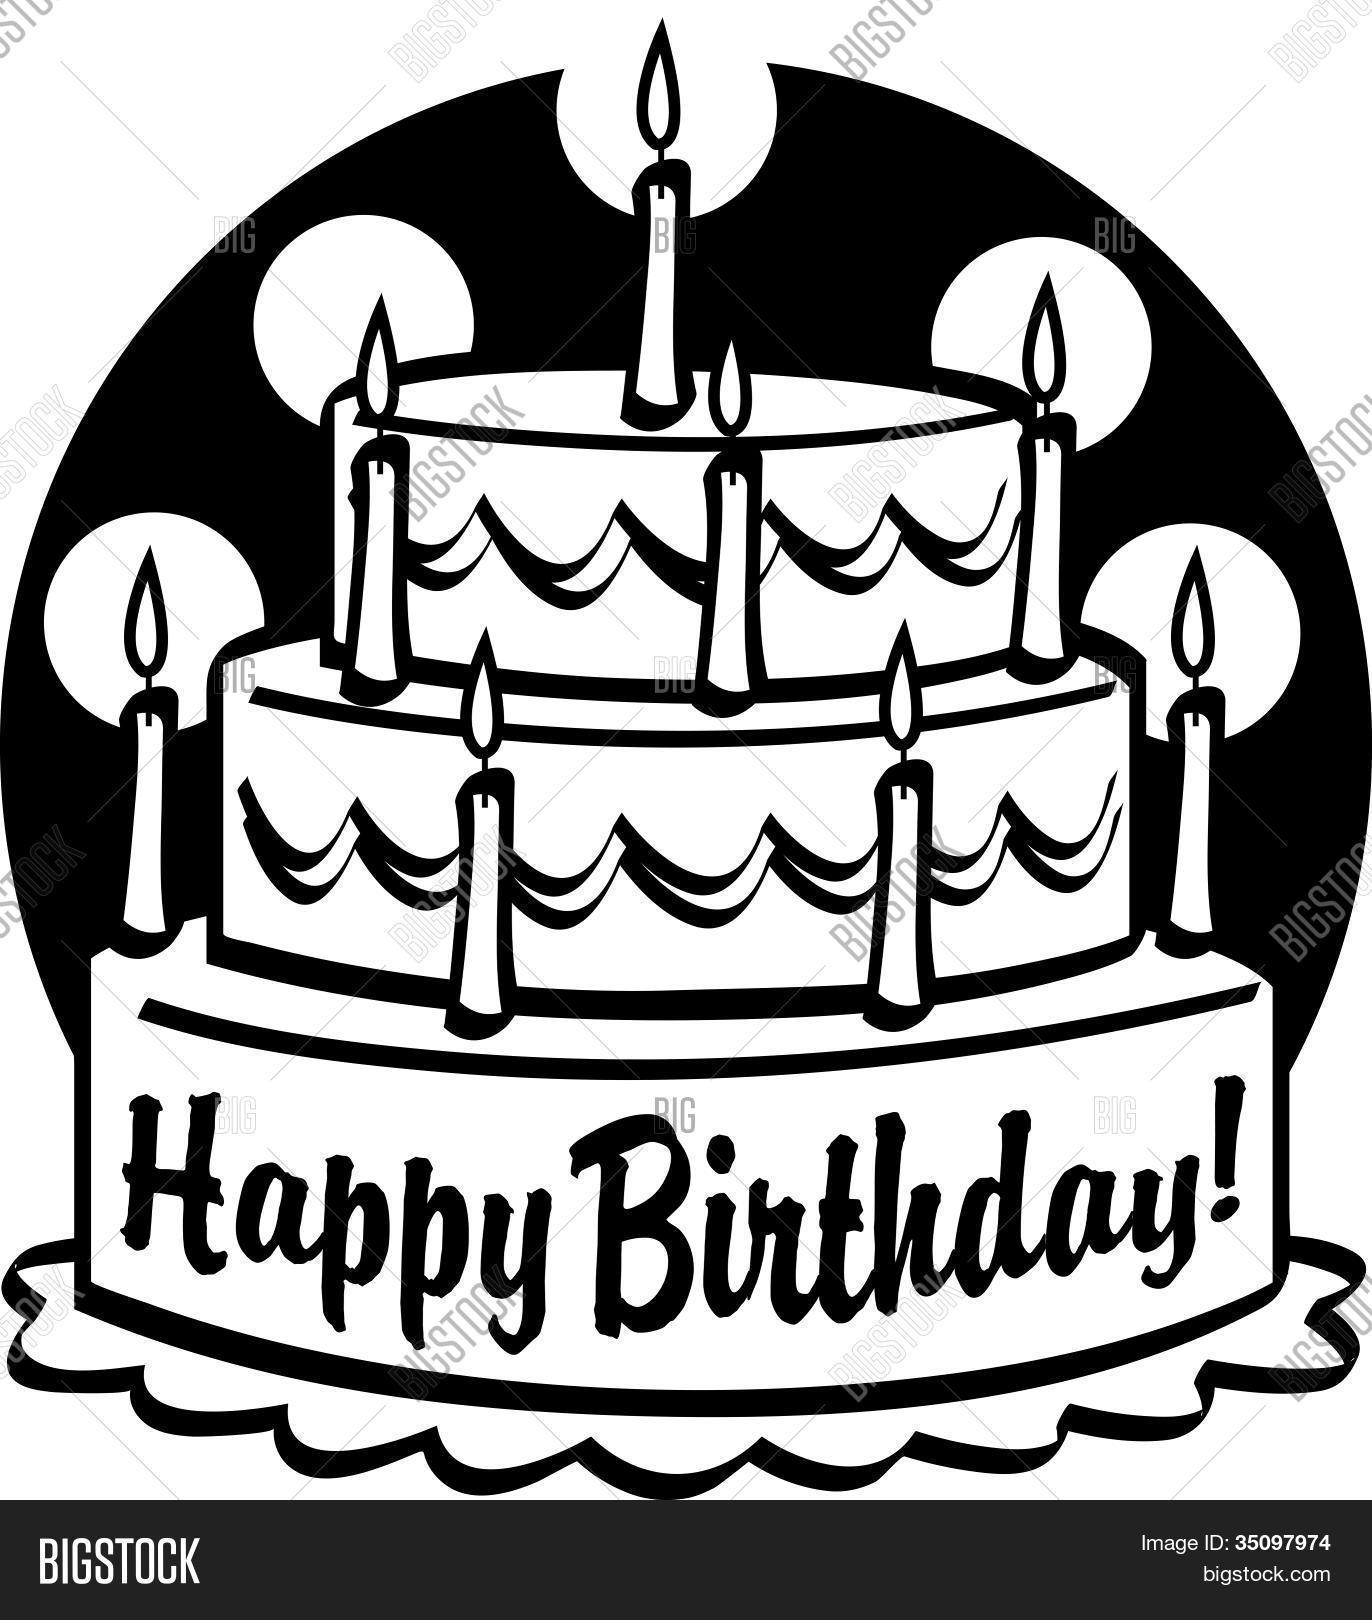 Happy Birthday Clipart Stock Vector & Stock Photos.